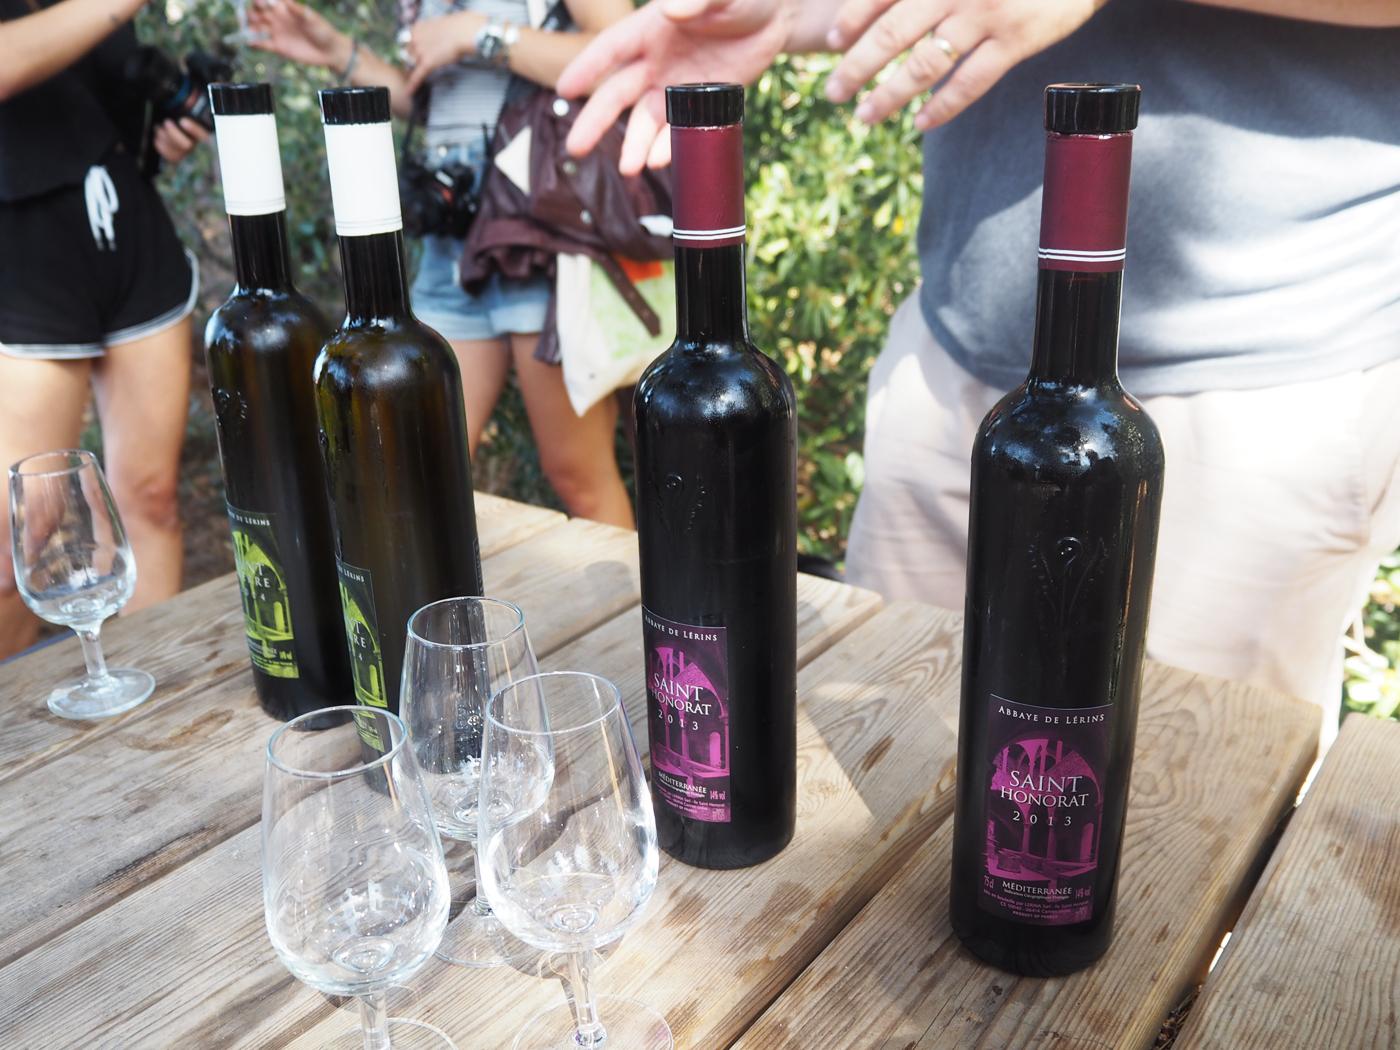 St Honorat wine